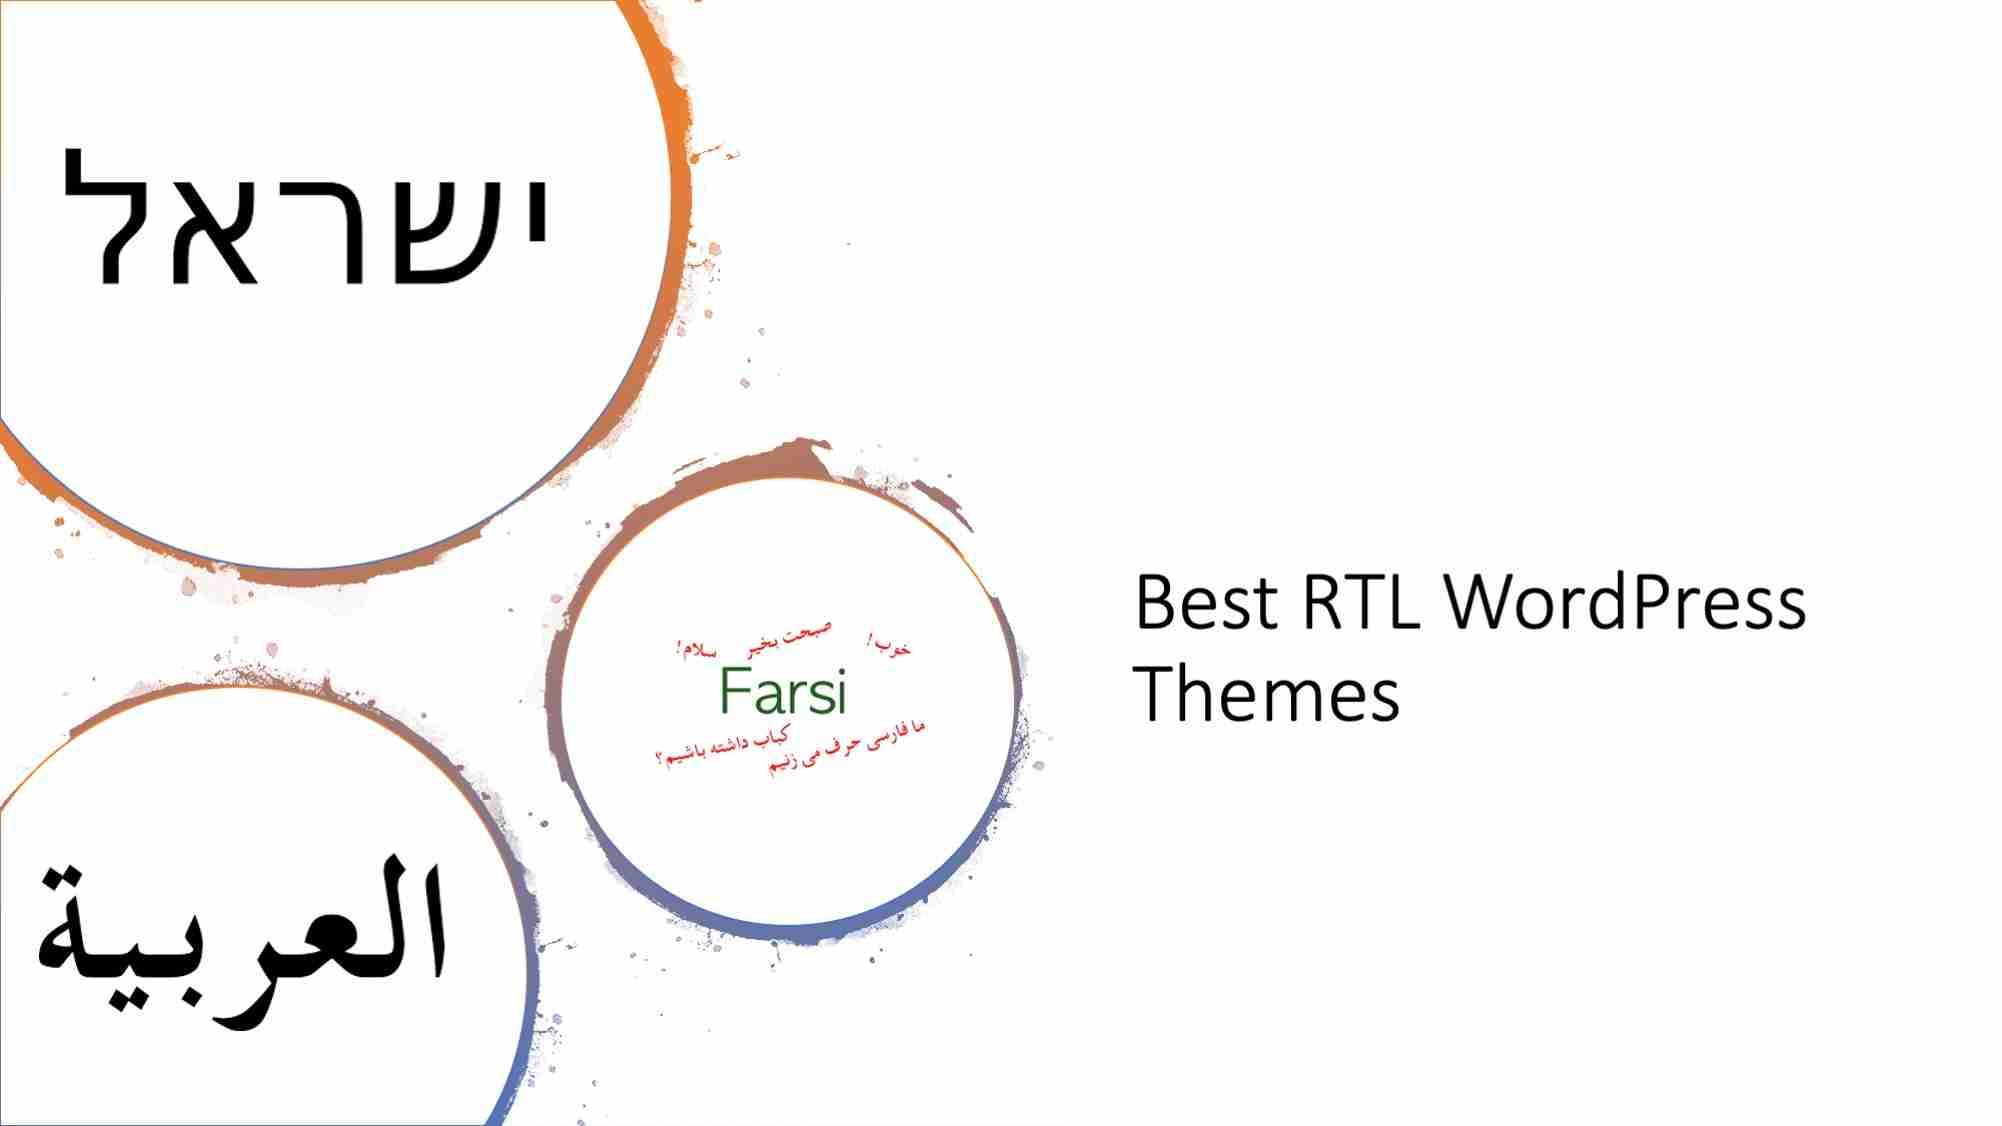 Best RTL WordPress Themes